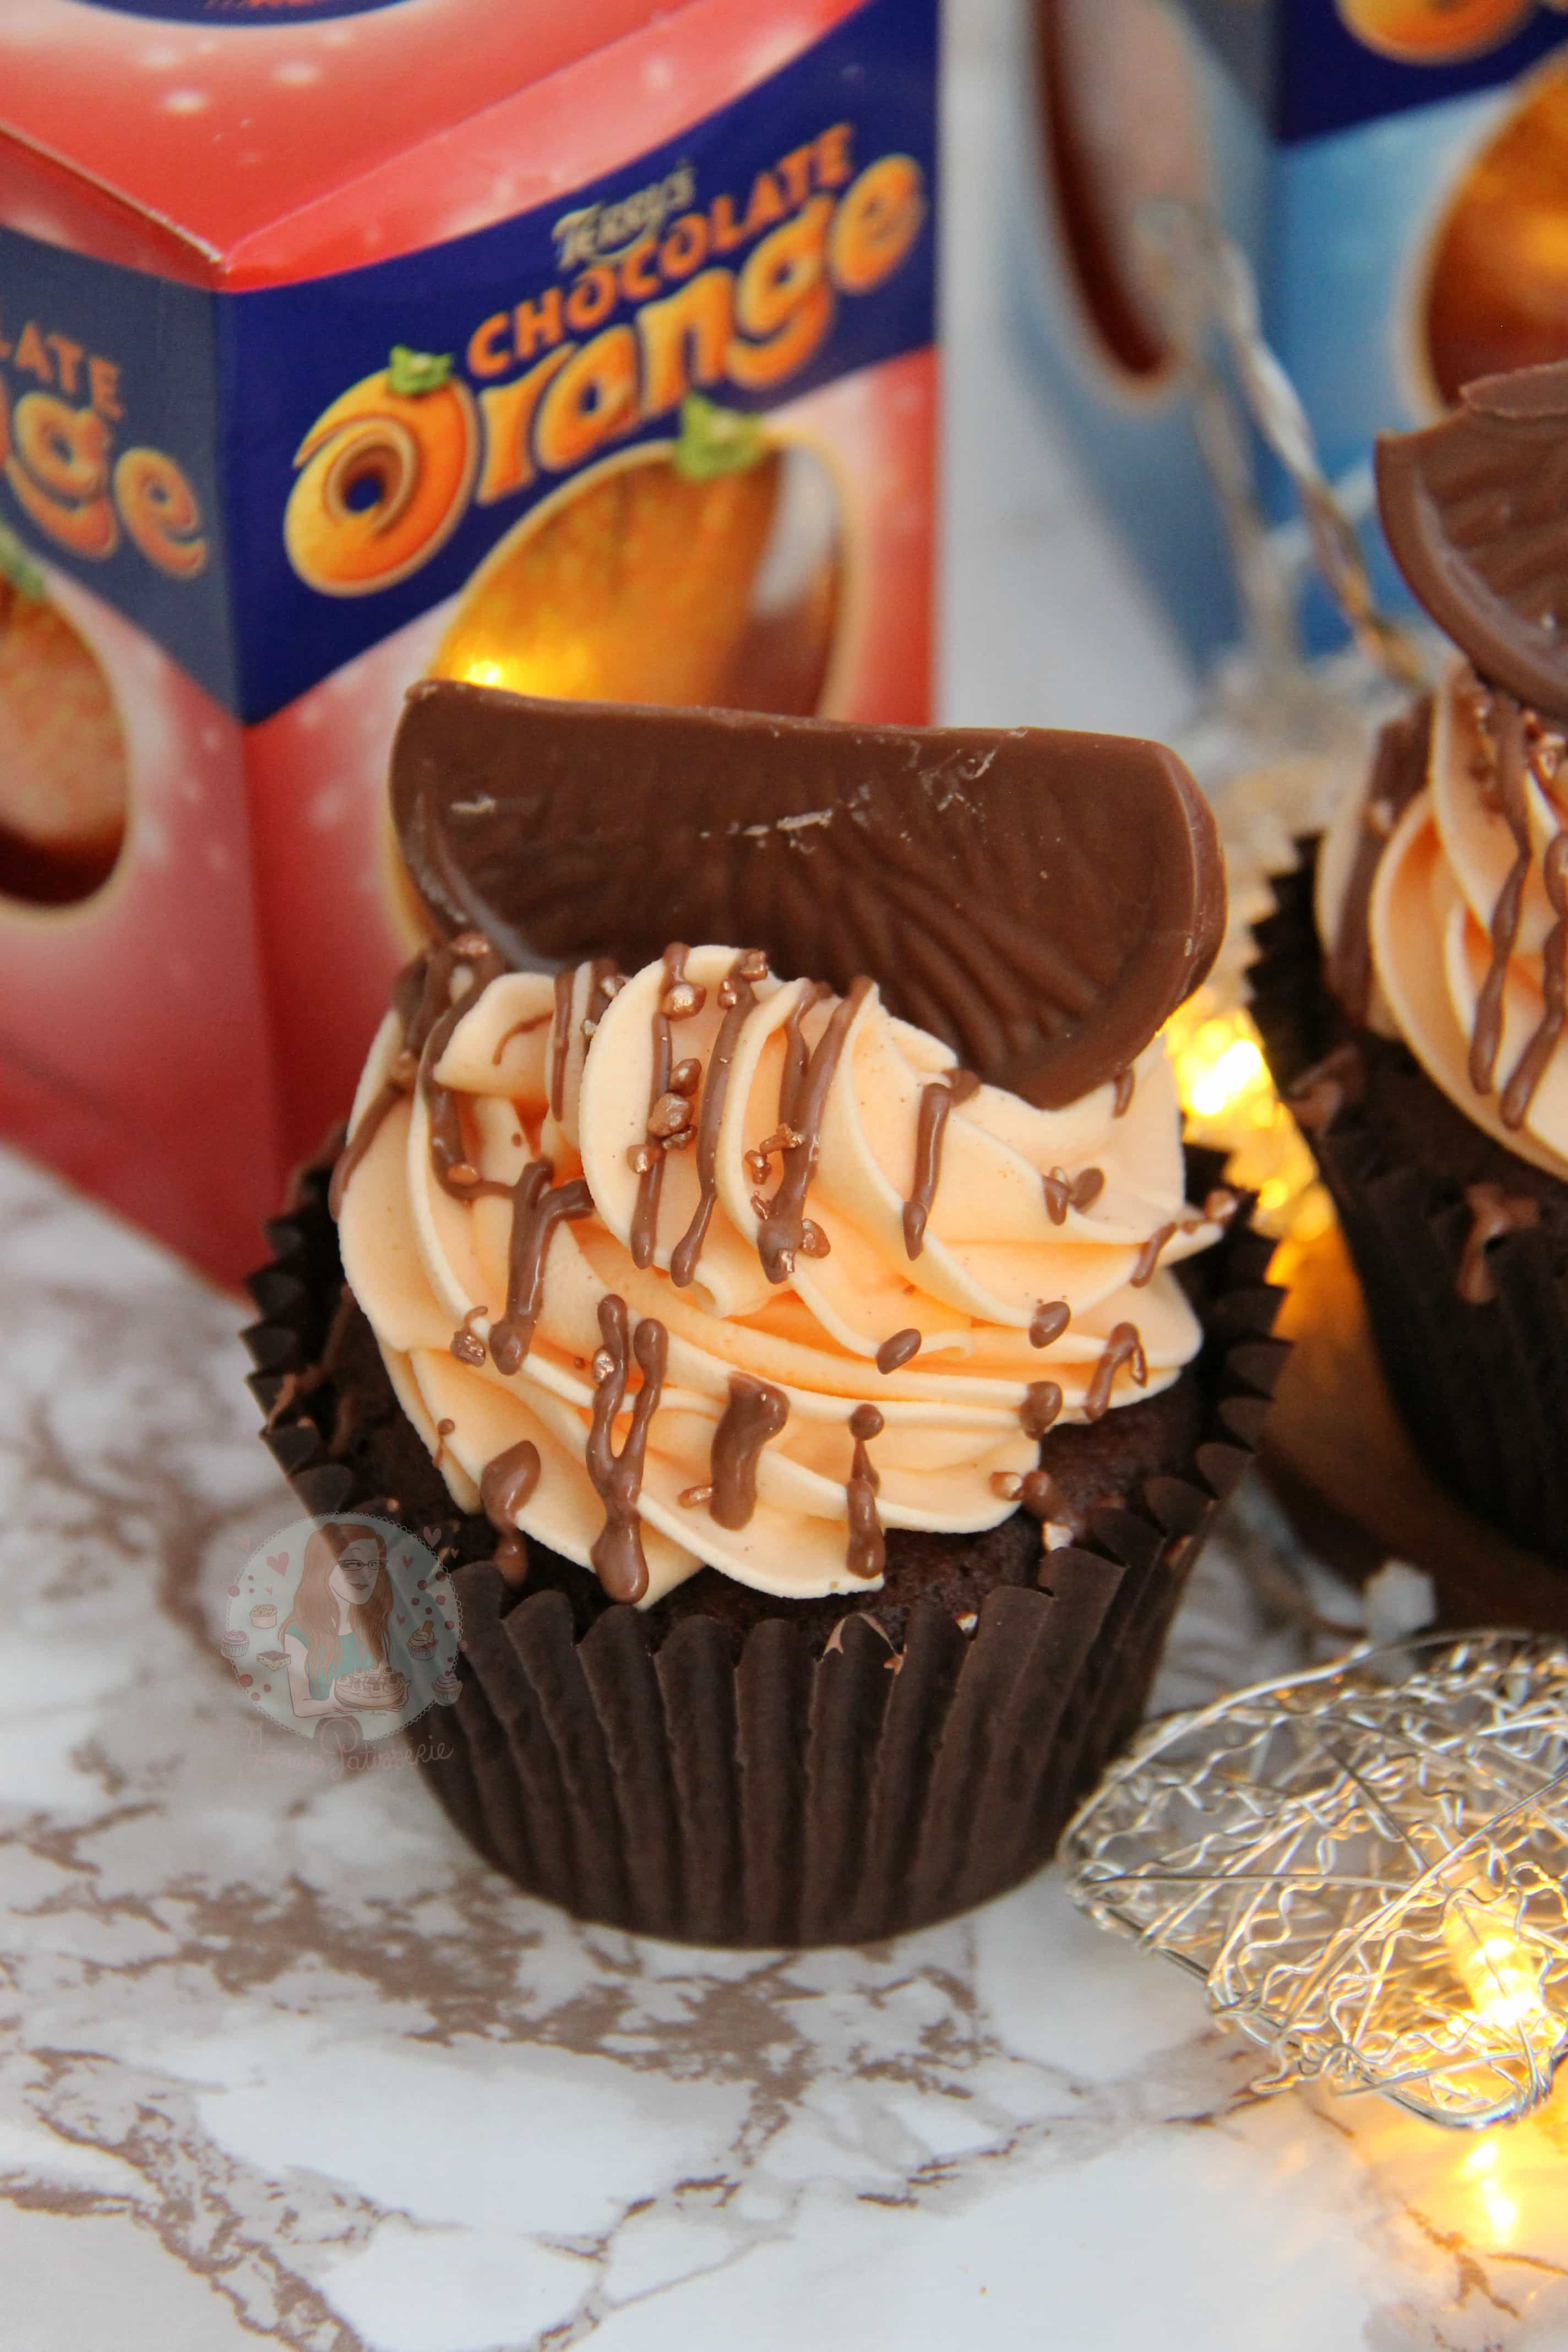 Terry's Chocolate Orange Cupcakes! - Jane's Patisserie